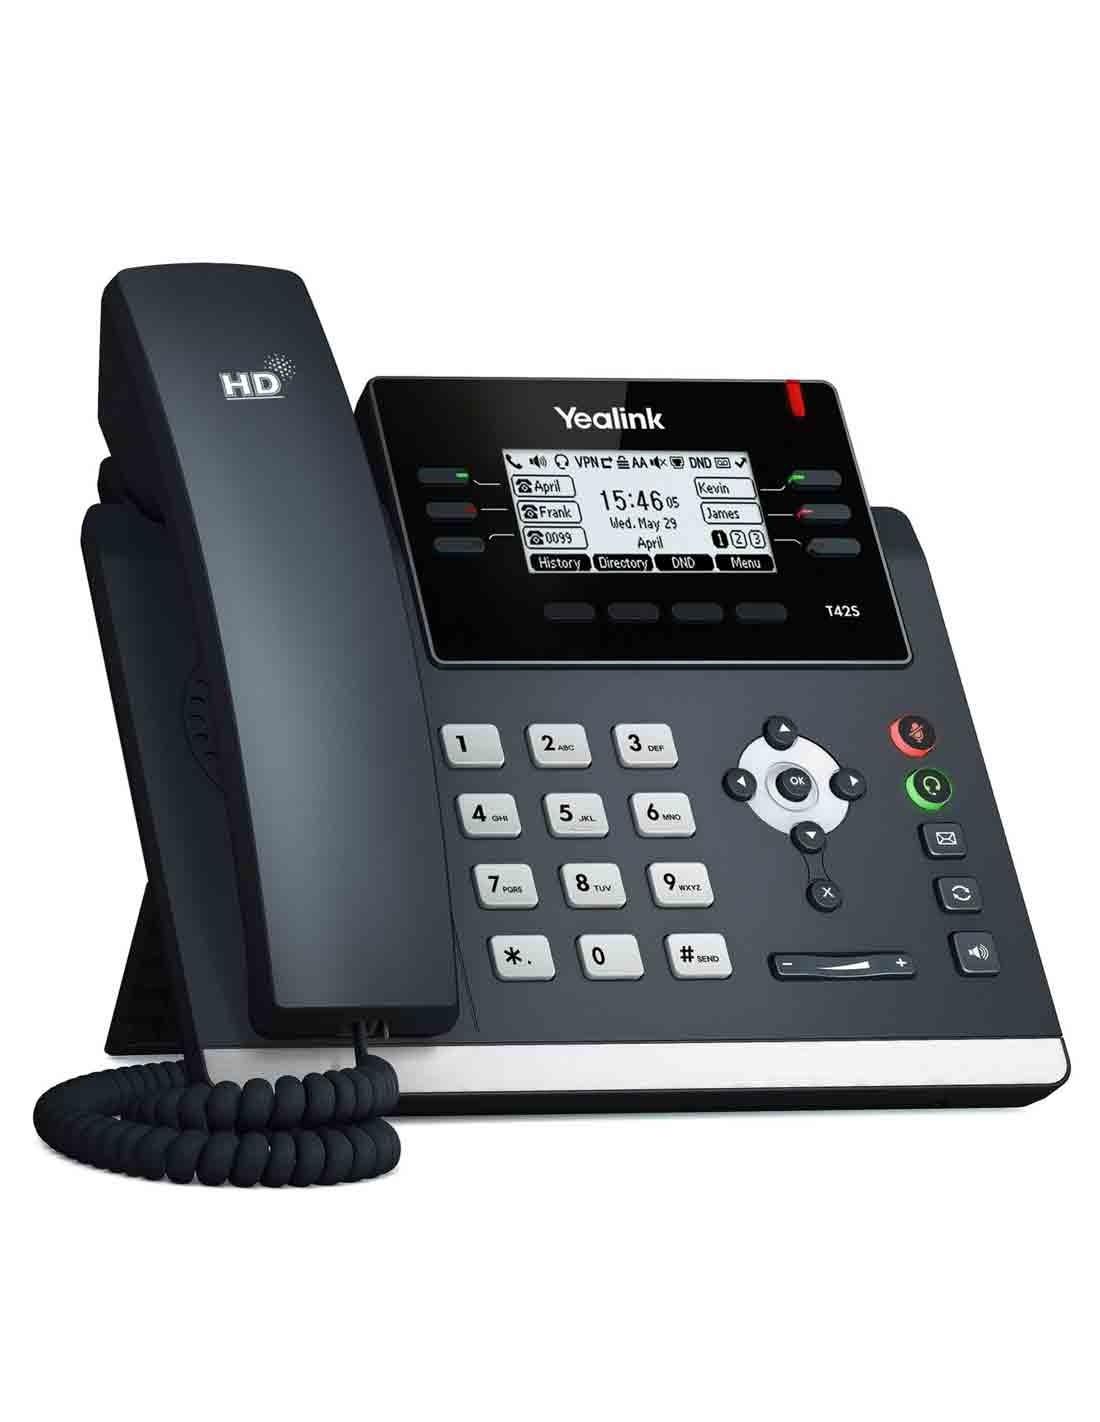 Yealink SIP-T42S IP Phone Images